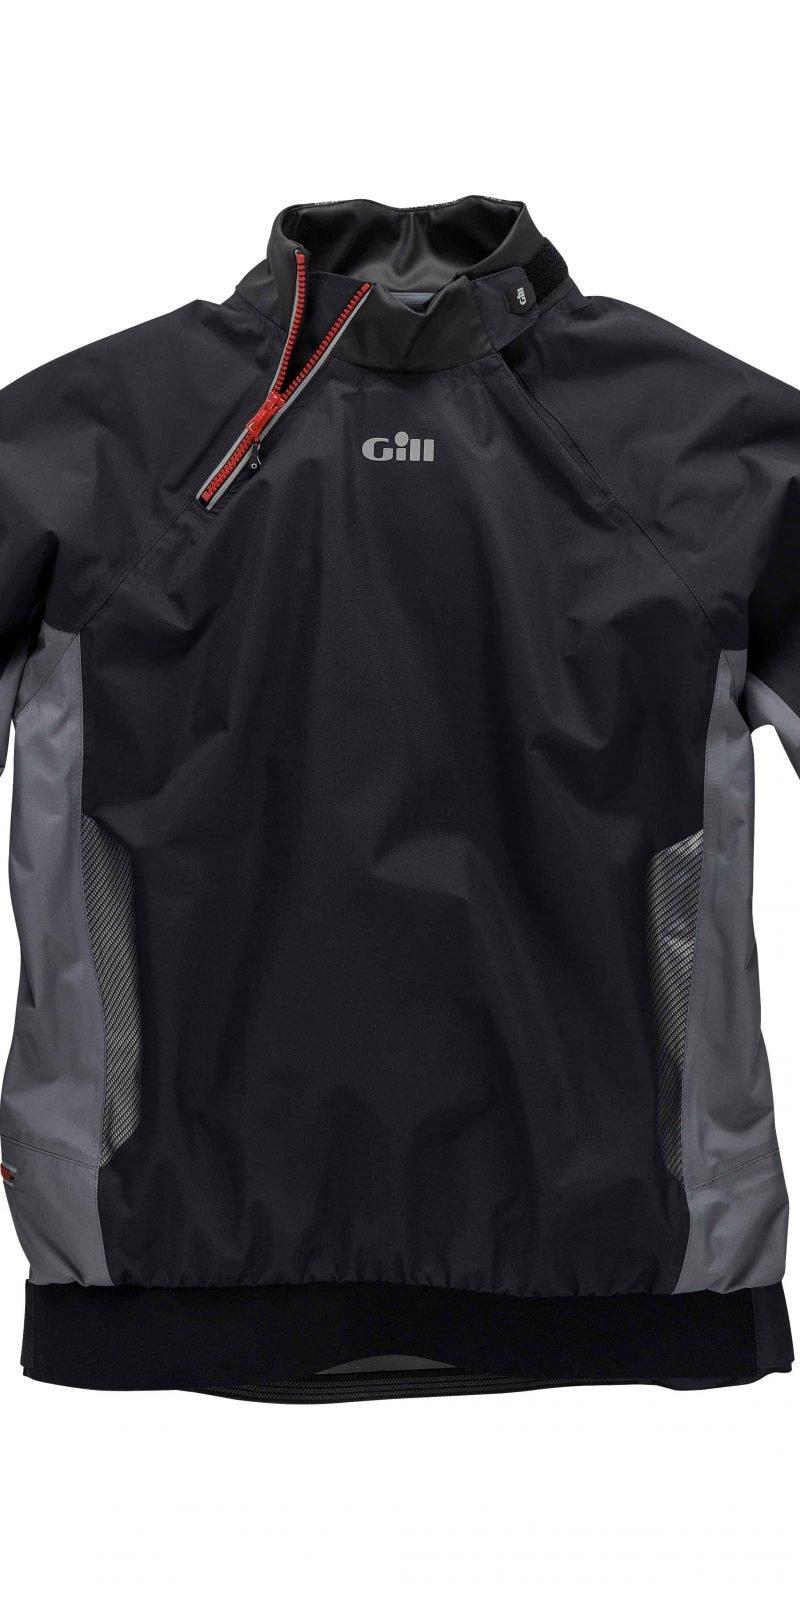 Gill – Race Smock